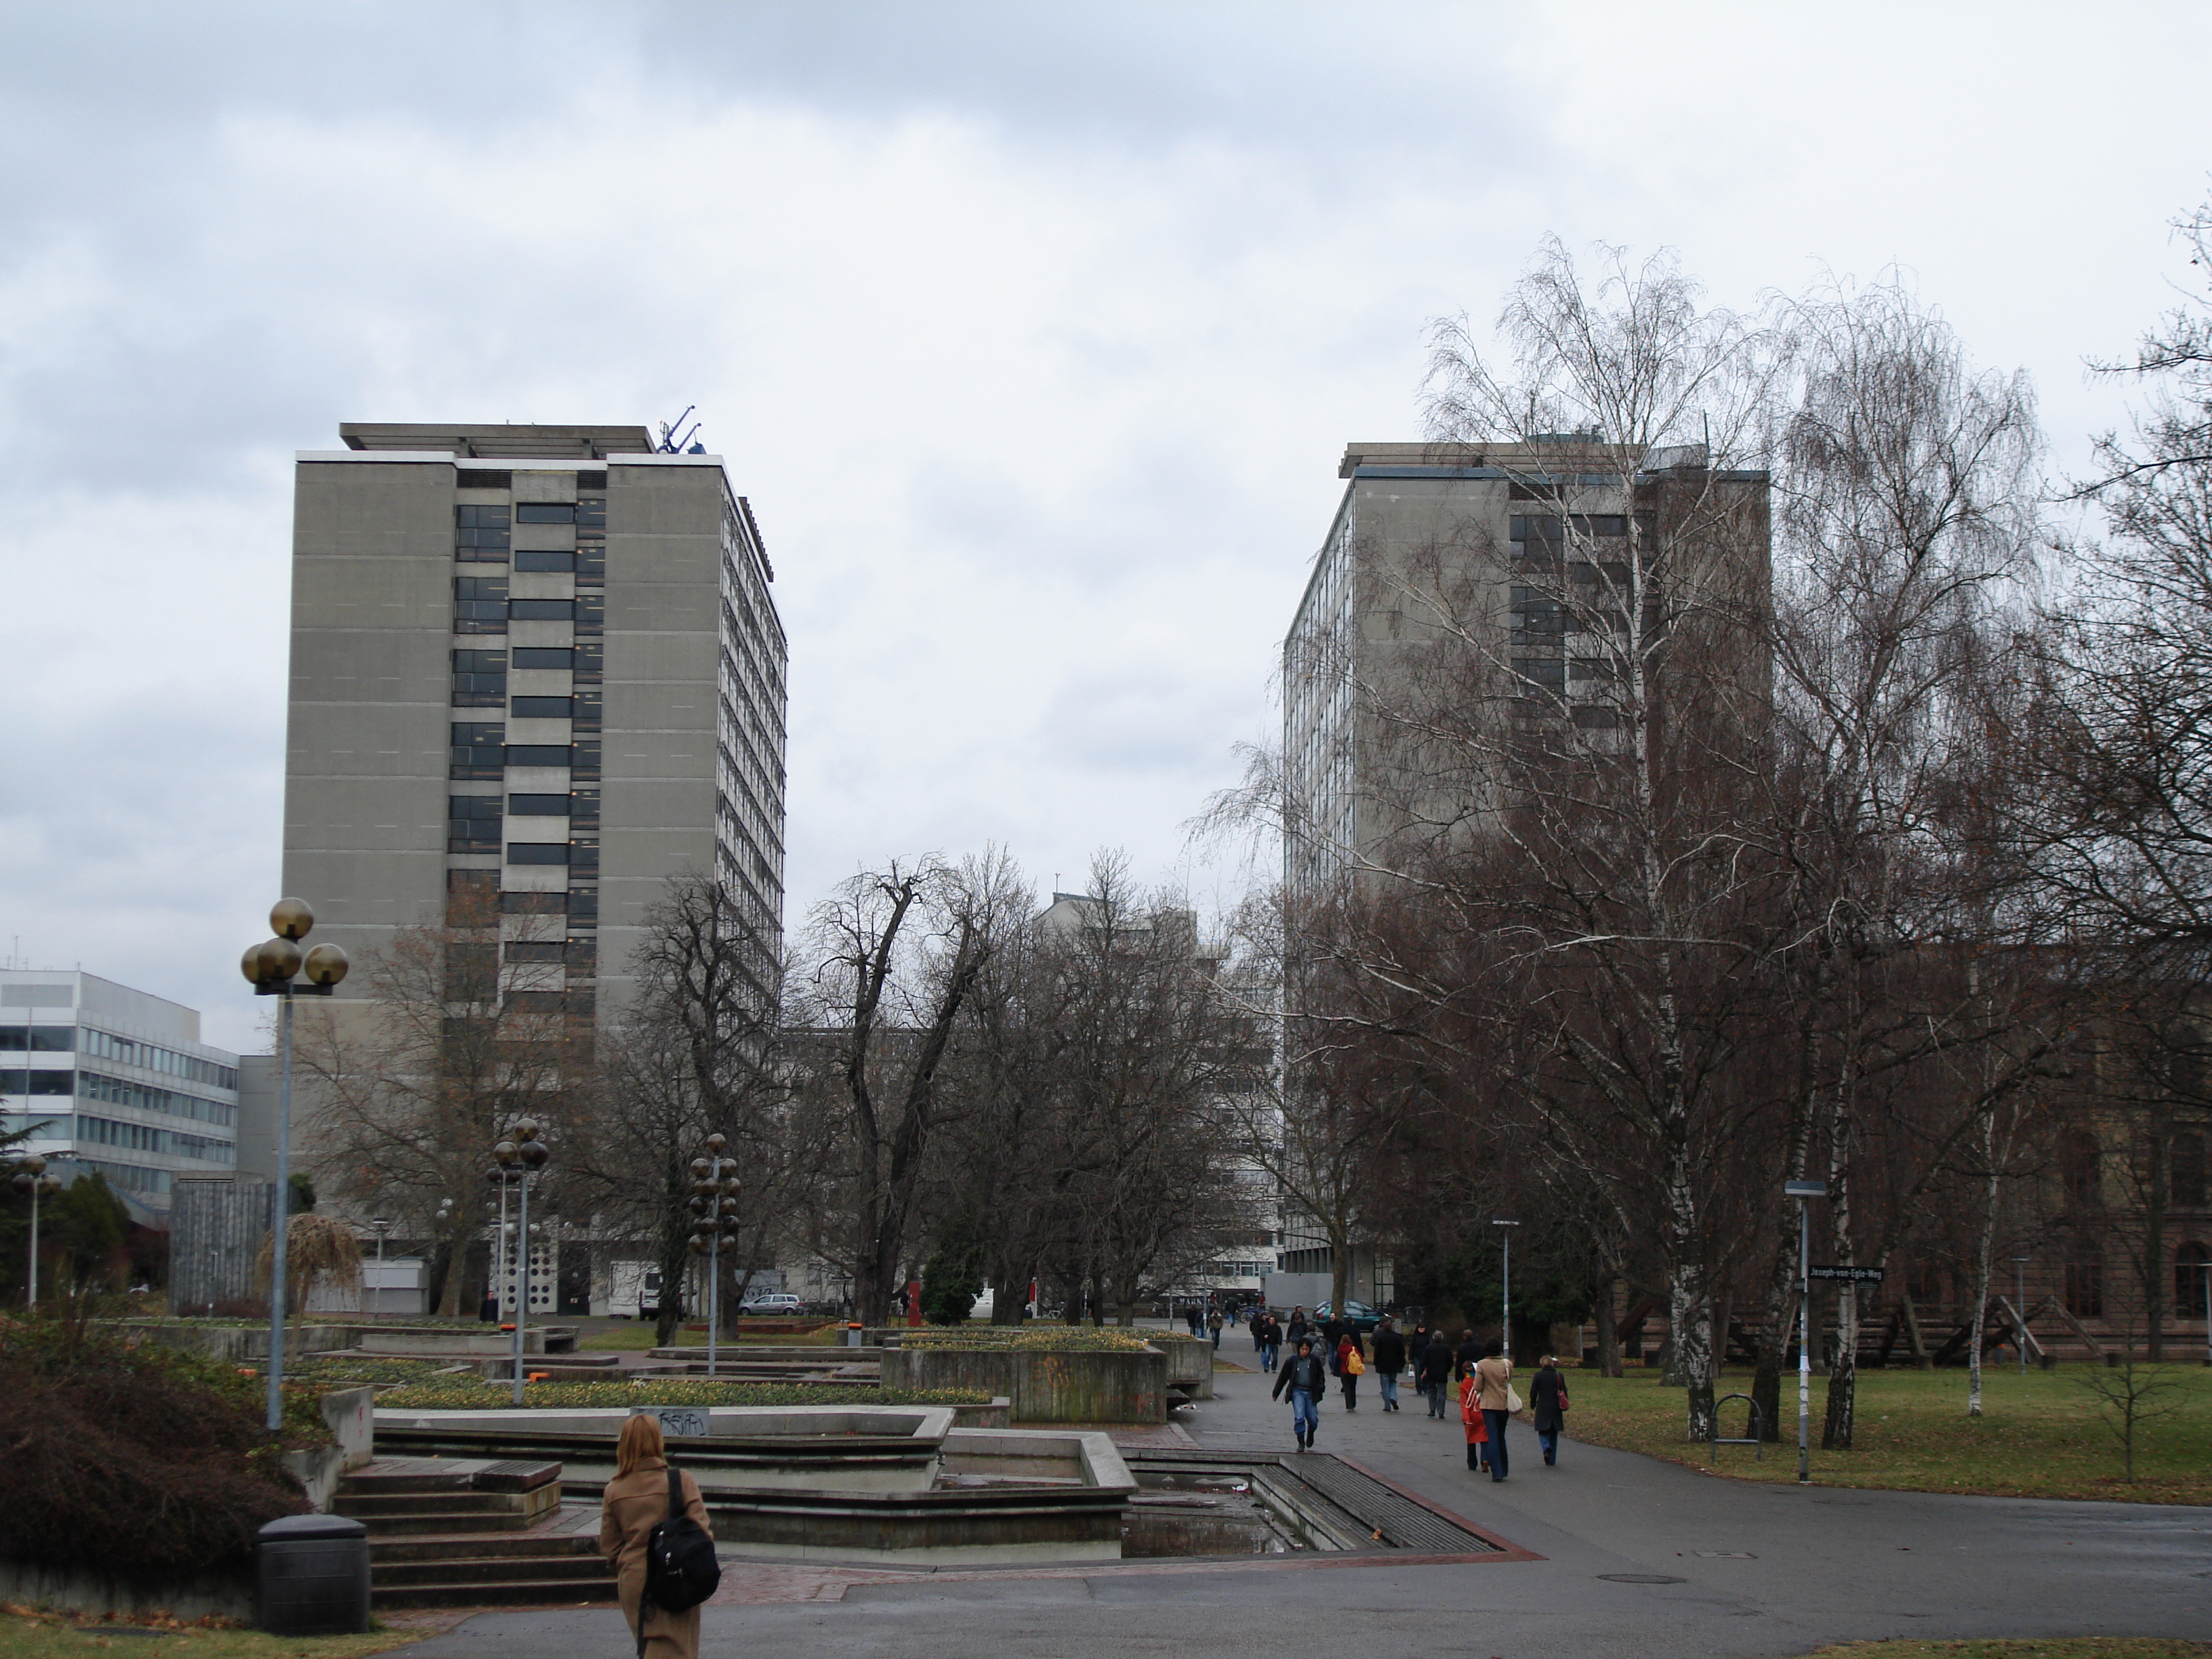 Kollegiengebäude 1 Ki Keplerstraße 11 Rechts Und 2 Kii 17 Links In Stuttgart Mitte